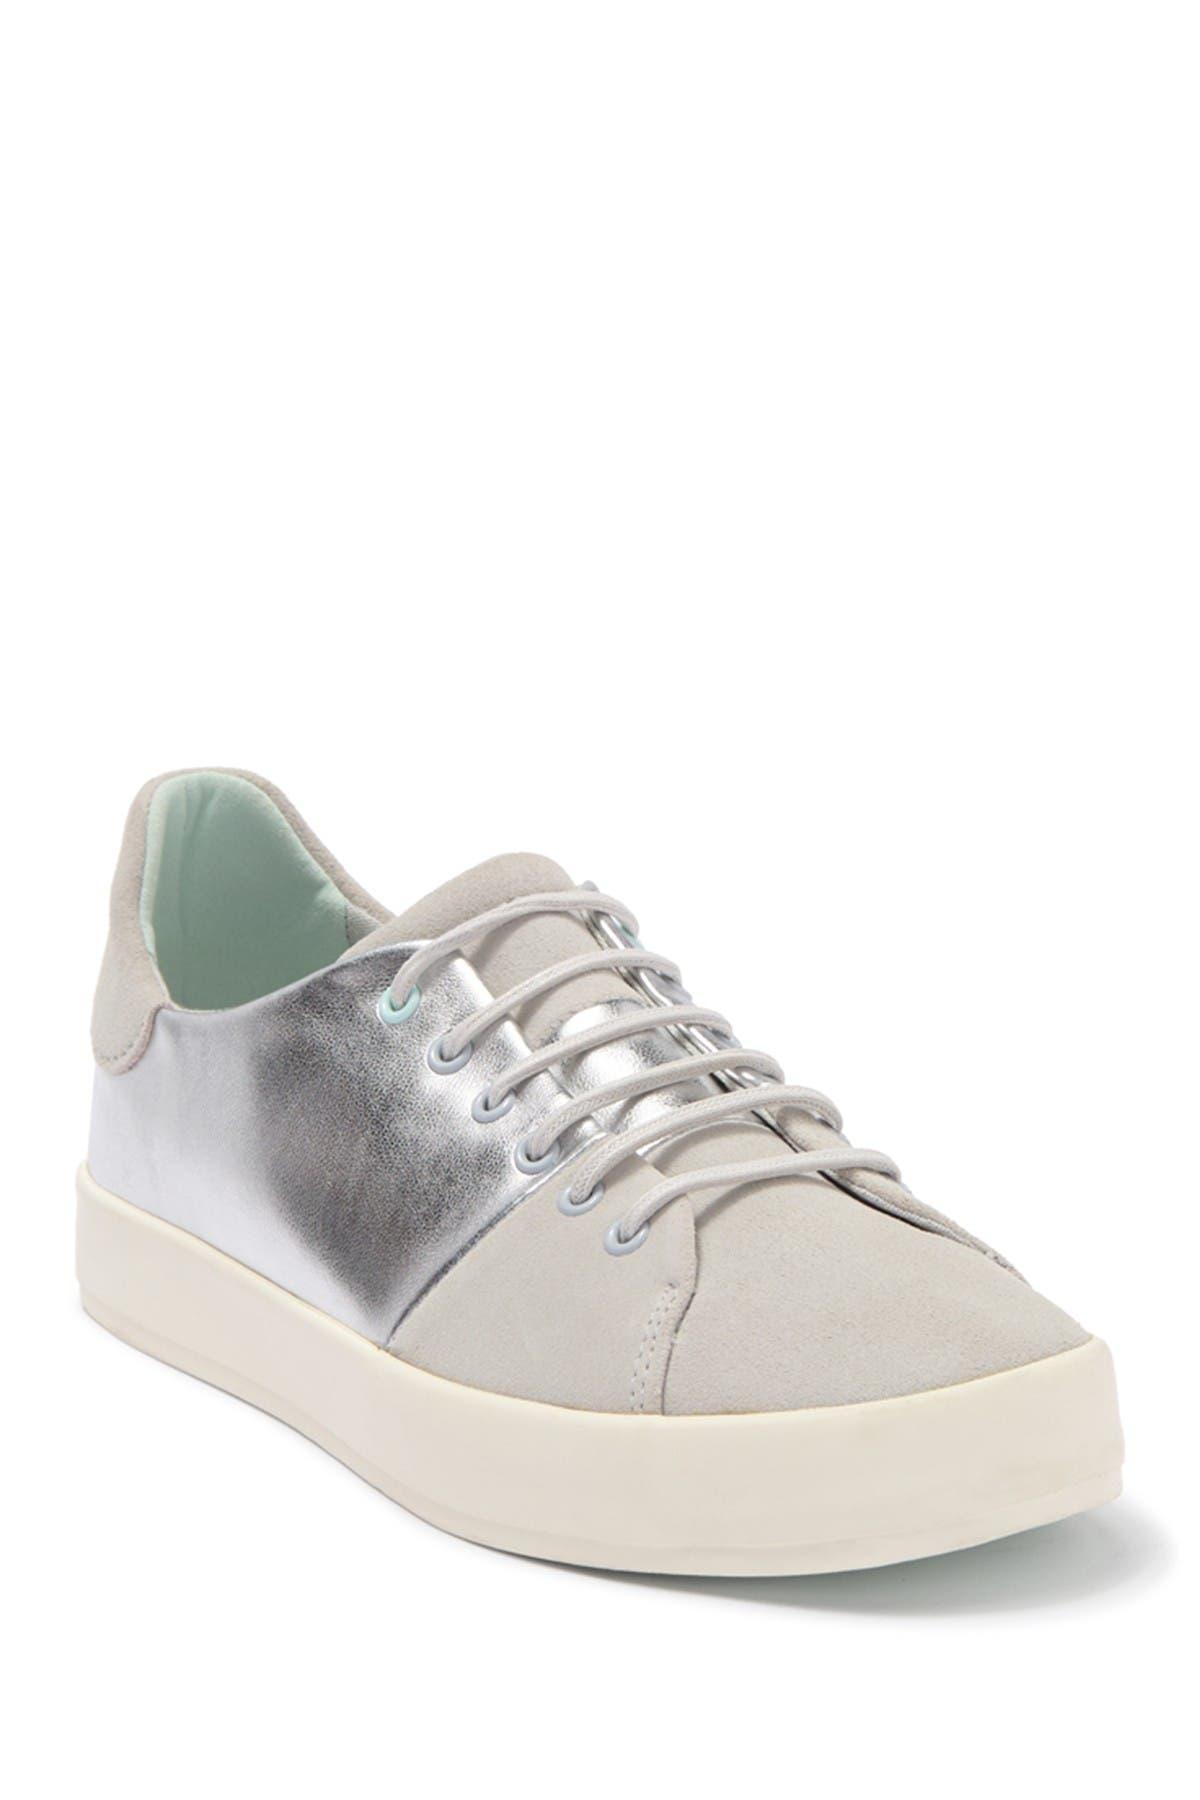 Image of Creative Recreation Carda Low Top Sneaker